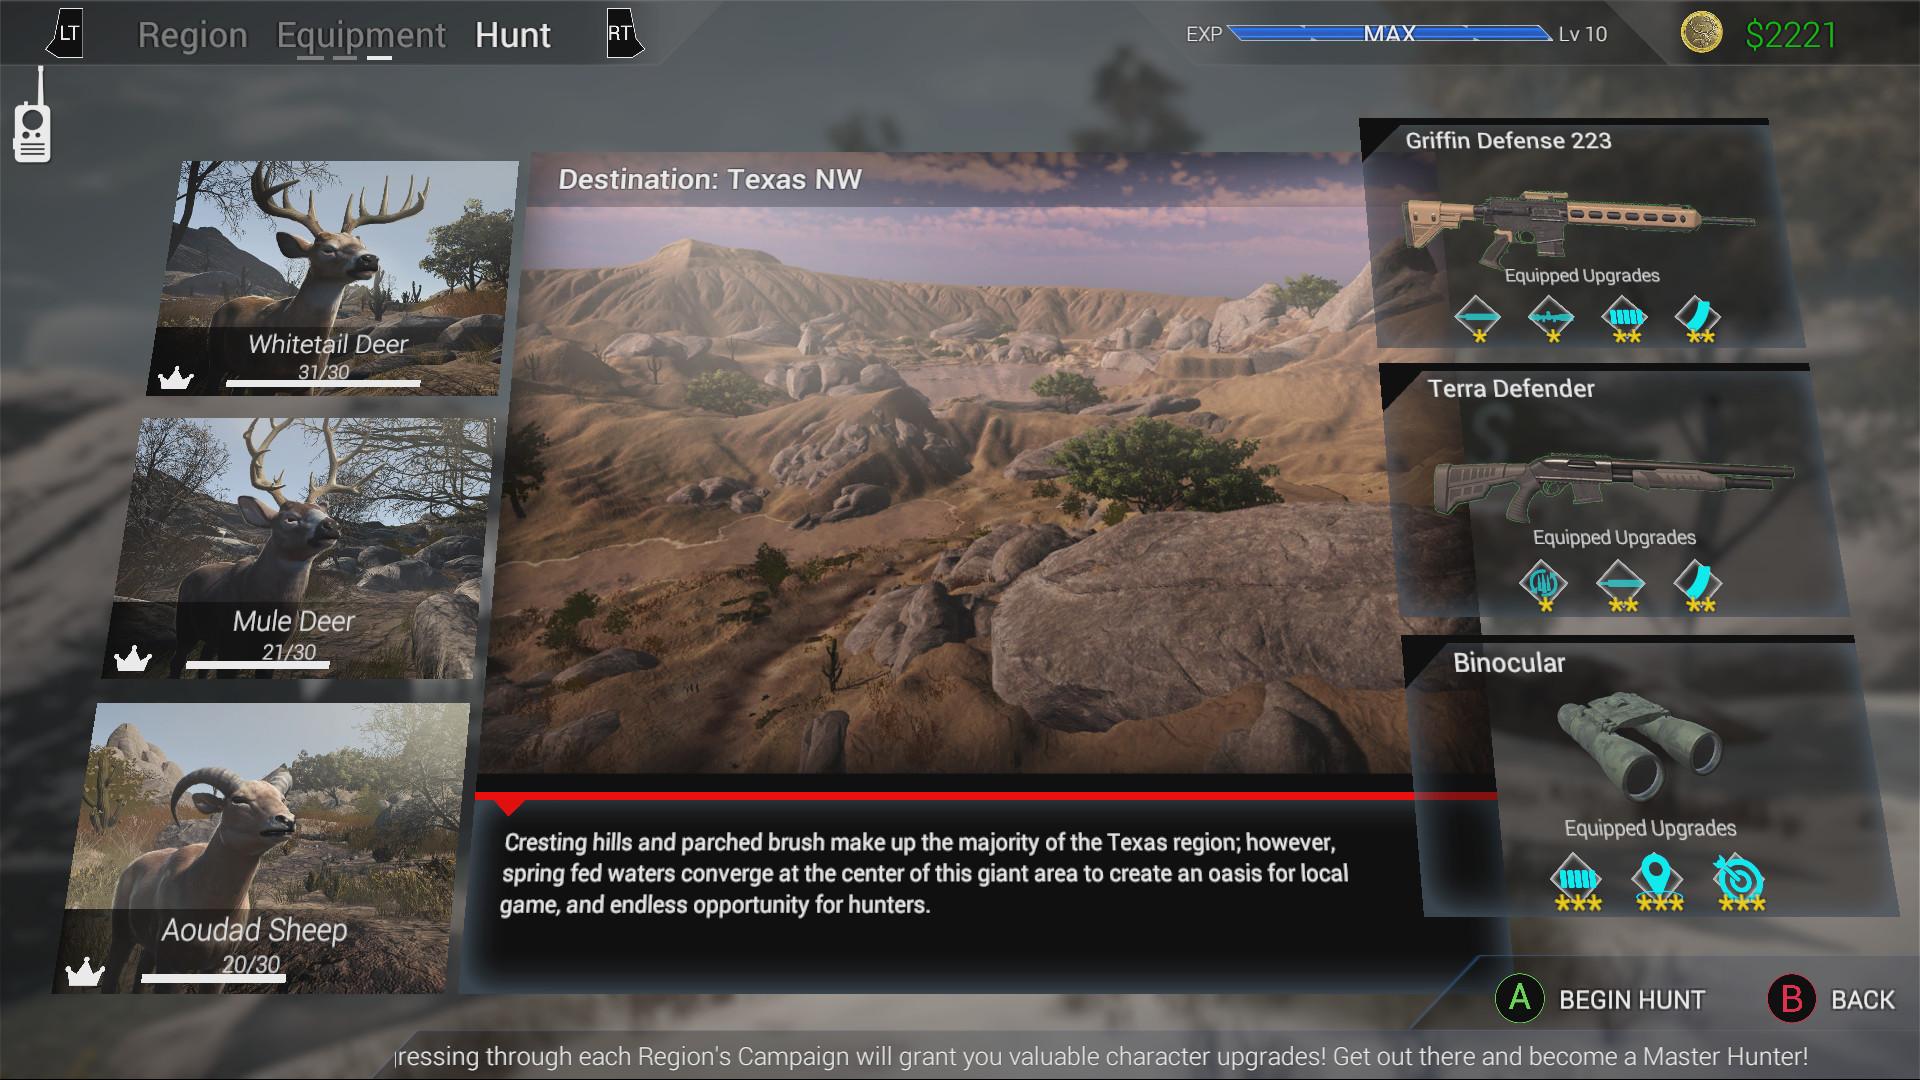 Играйте в deer hunter 2014 на пк и mac с bluestacks android эмулятором.